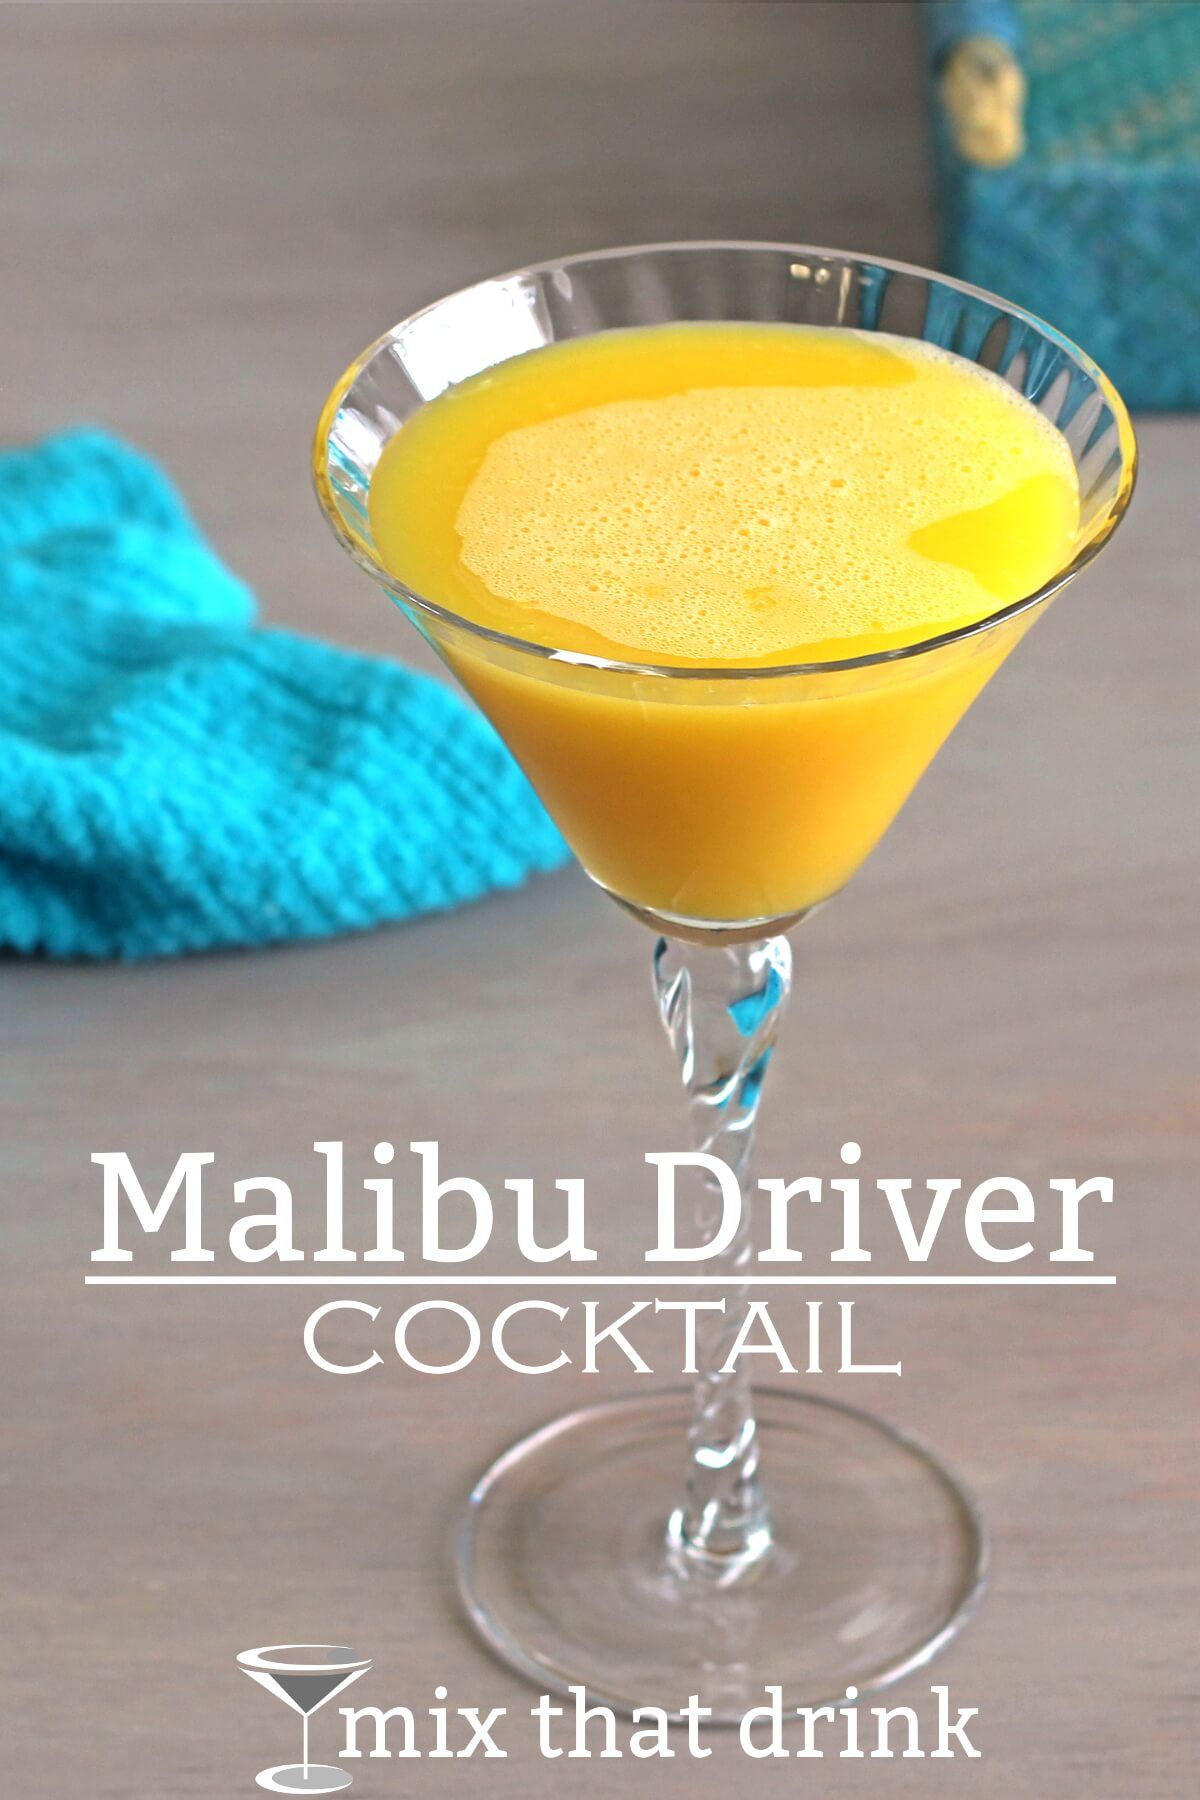 Malibu Driver drink recipe | Getränke | Pinterest | Getränke ...